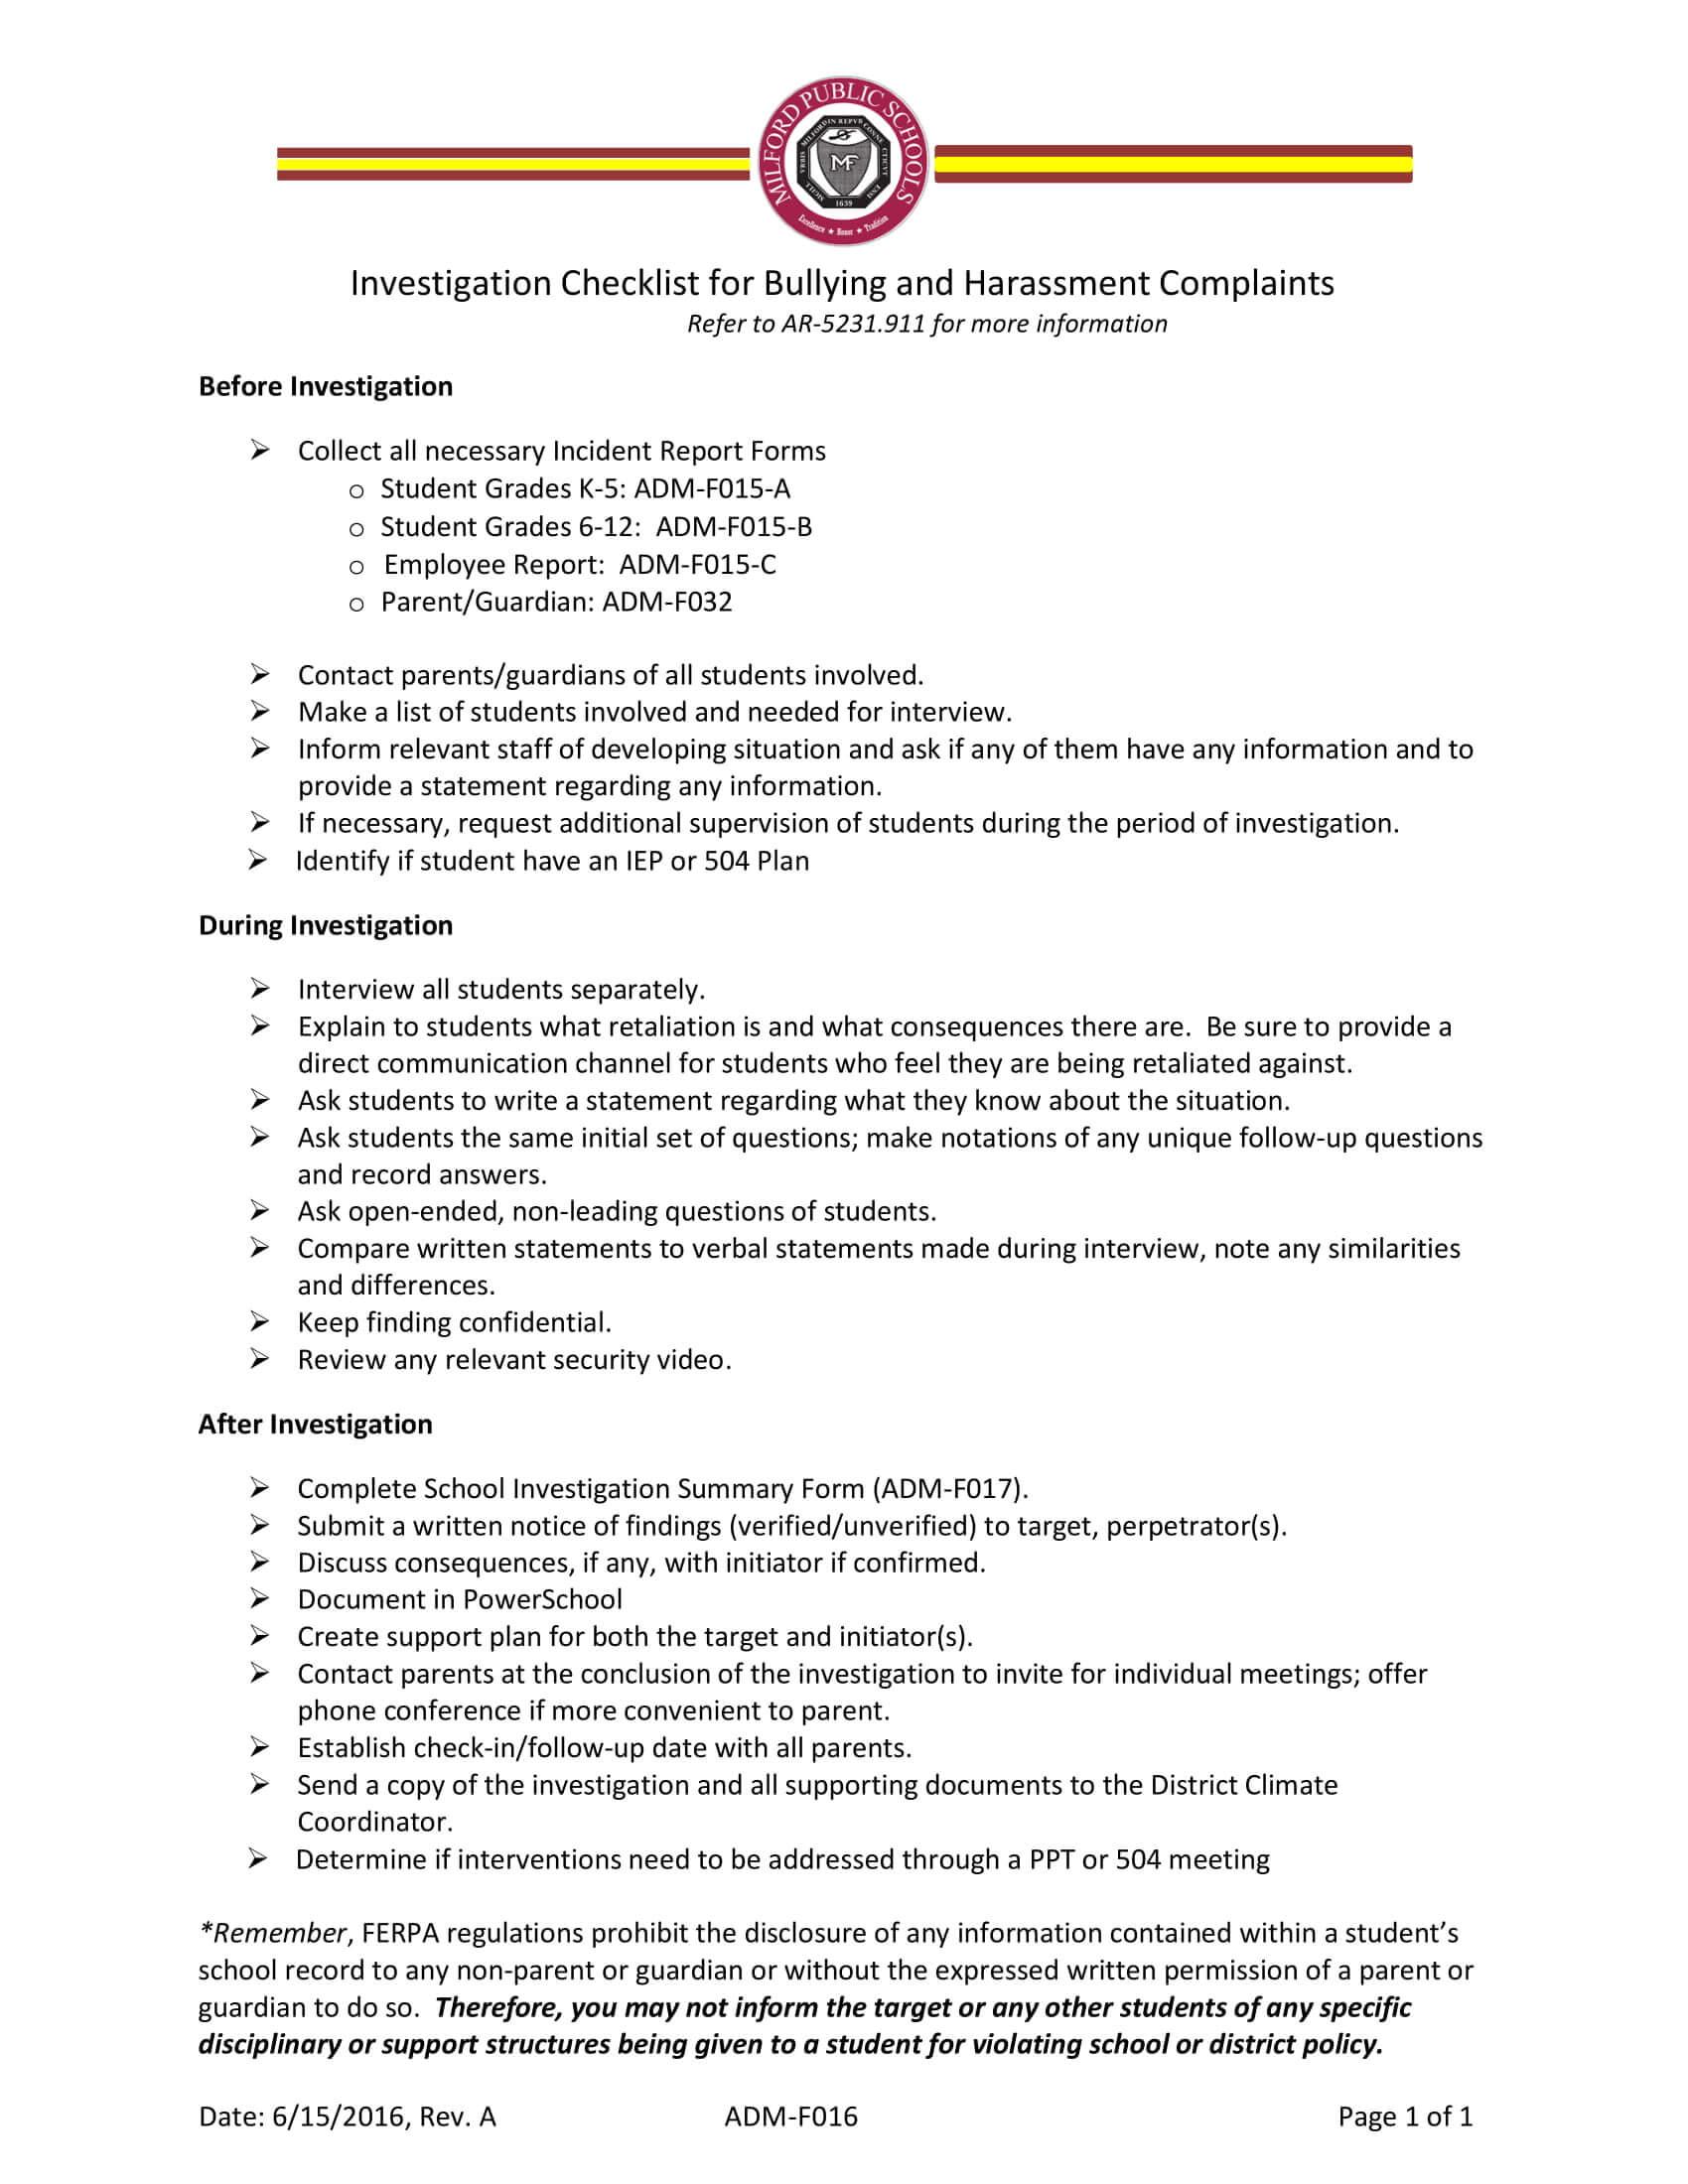 12+ Harassment Investigation Checklist Examples – Pdf For Sexual Harassment Investigation Report Template